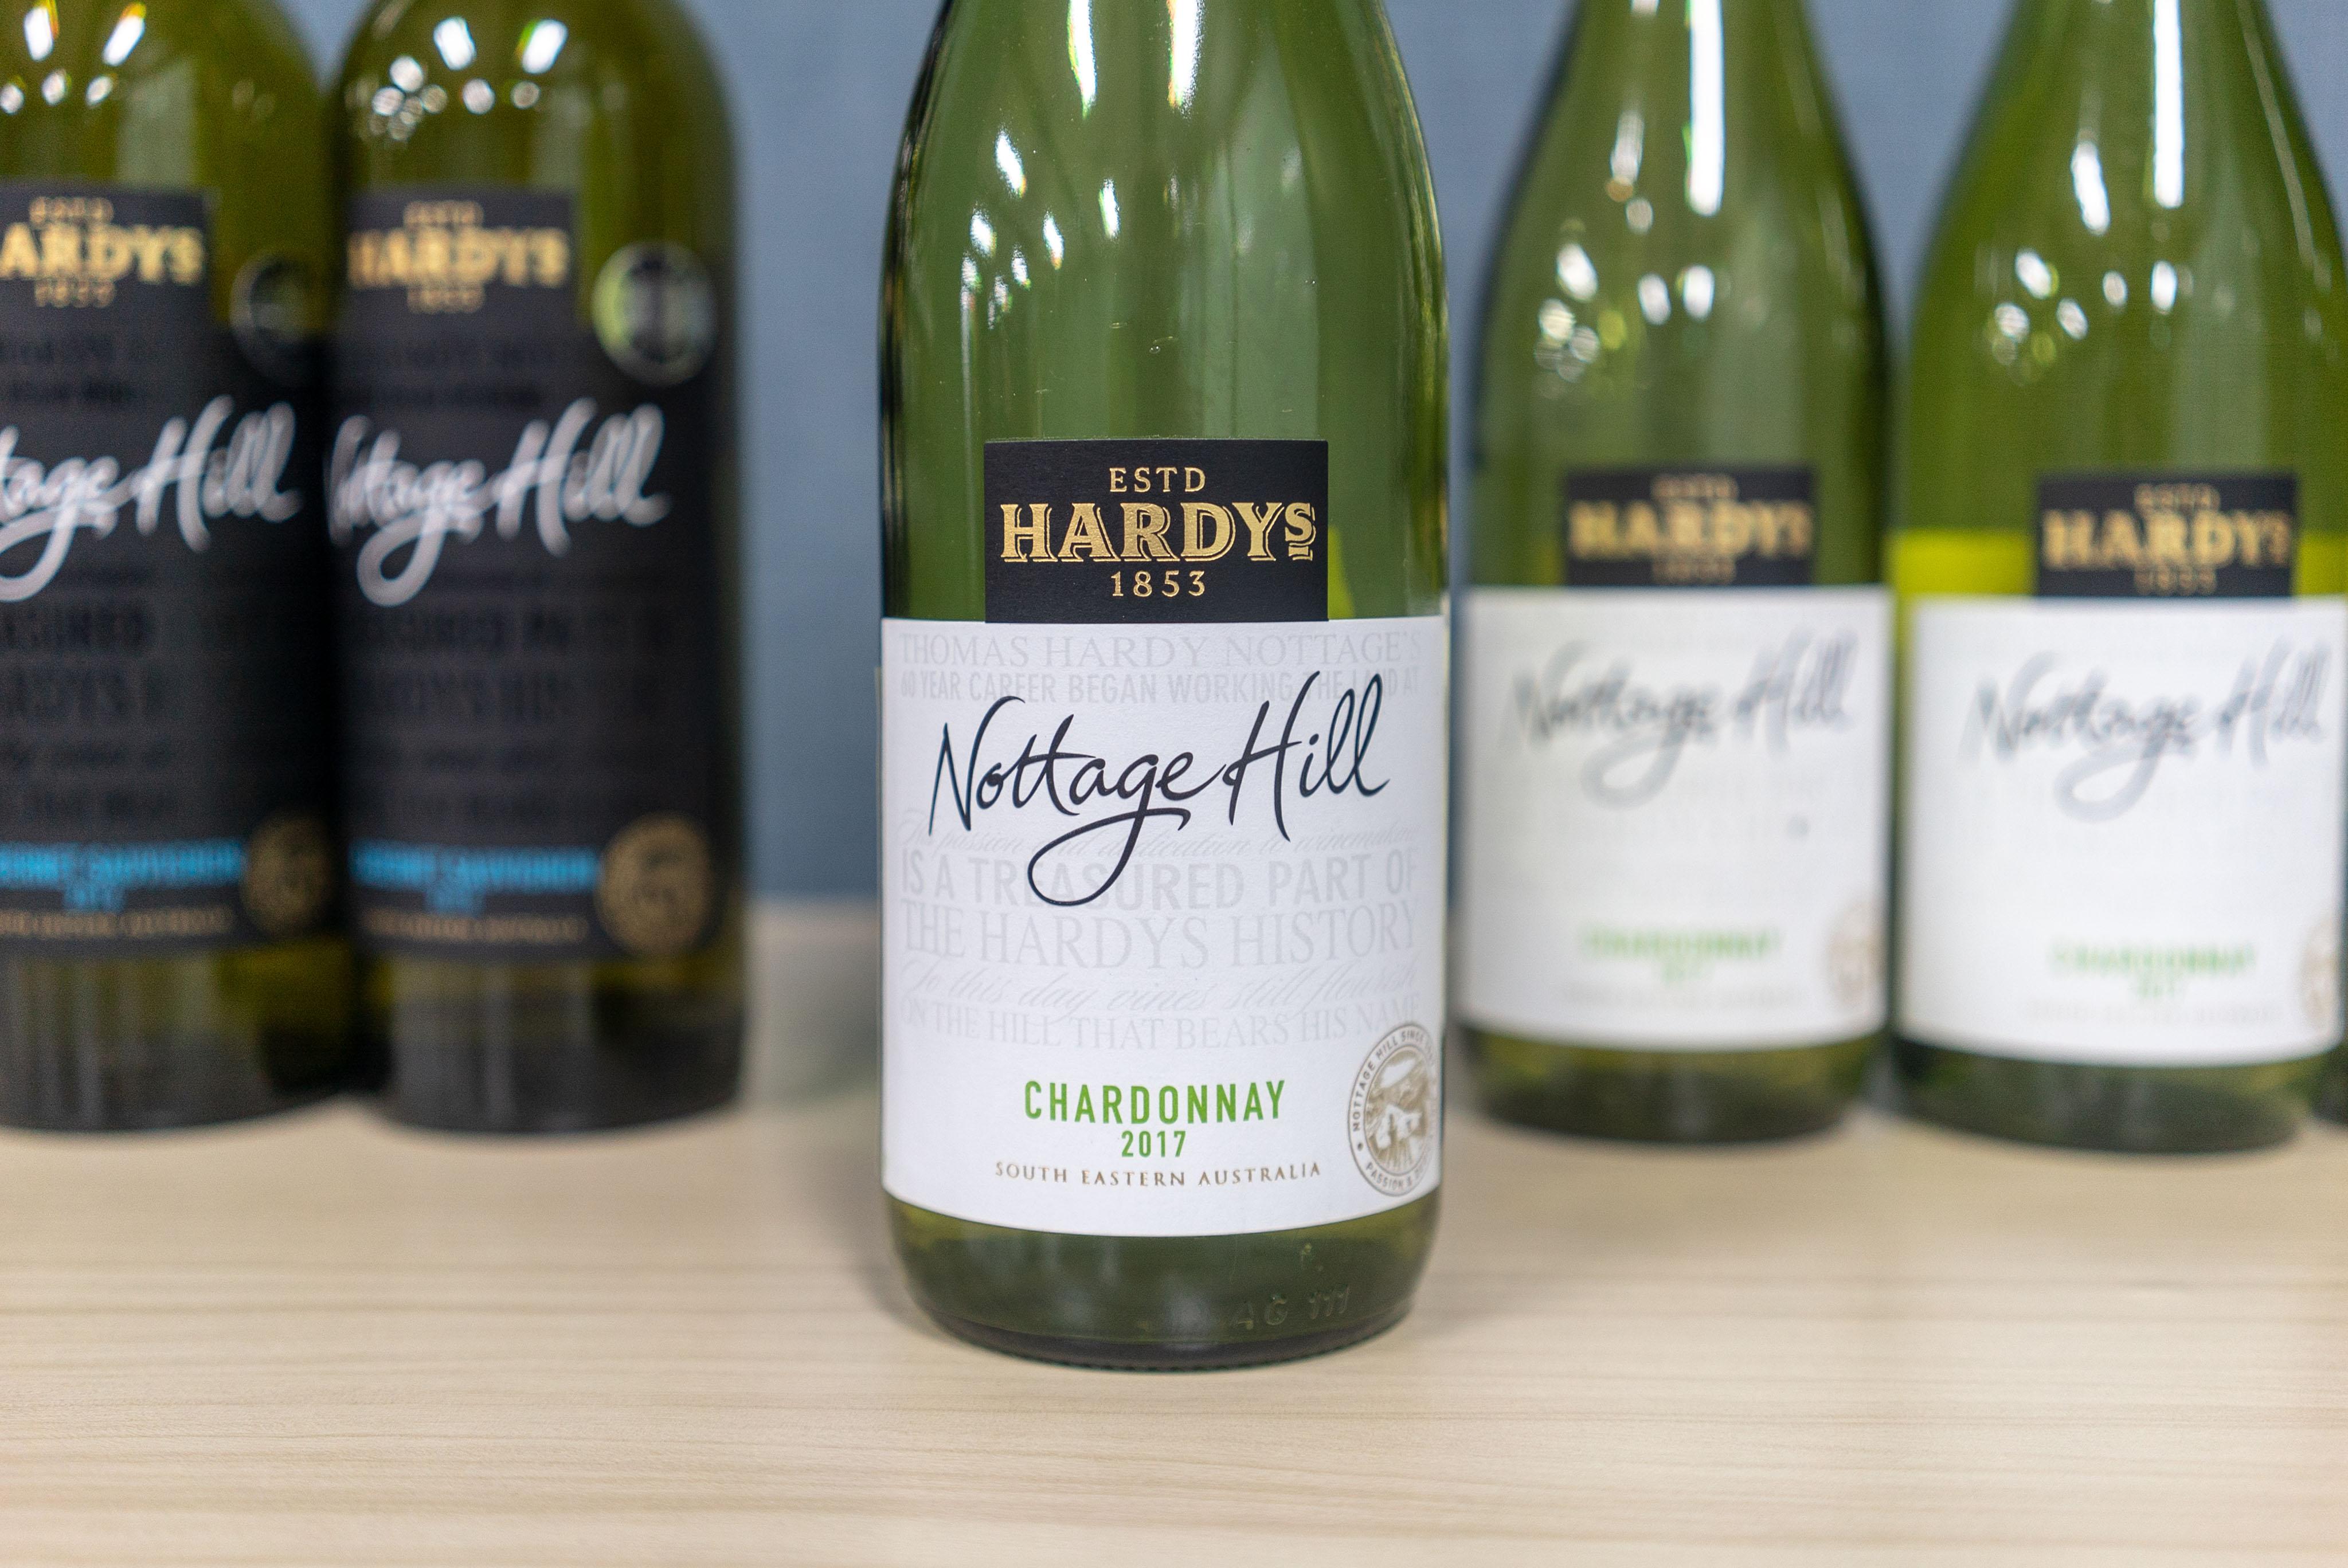 Hardys Nottage Hill Chardonnay 2017